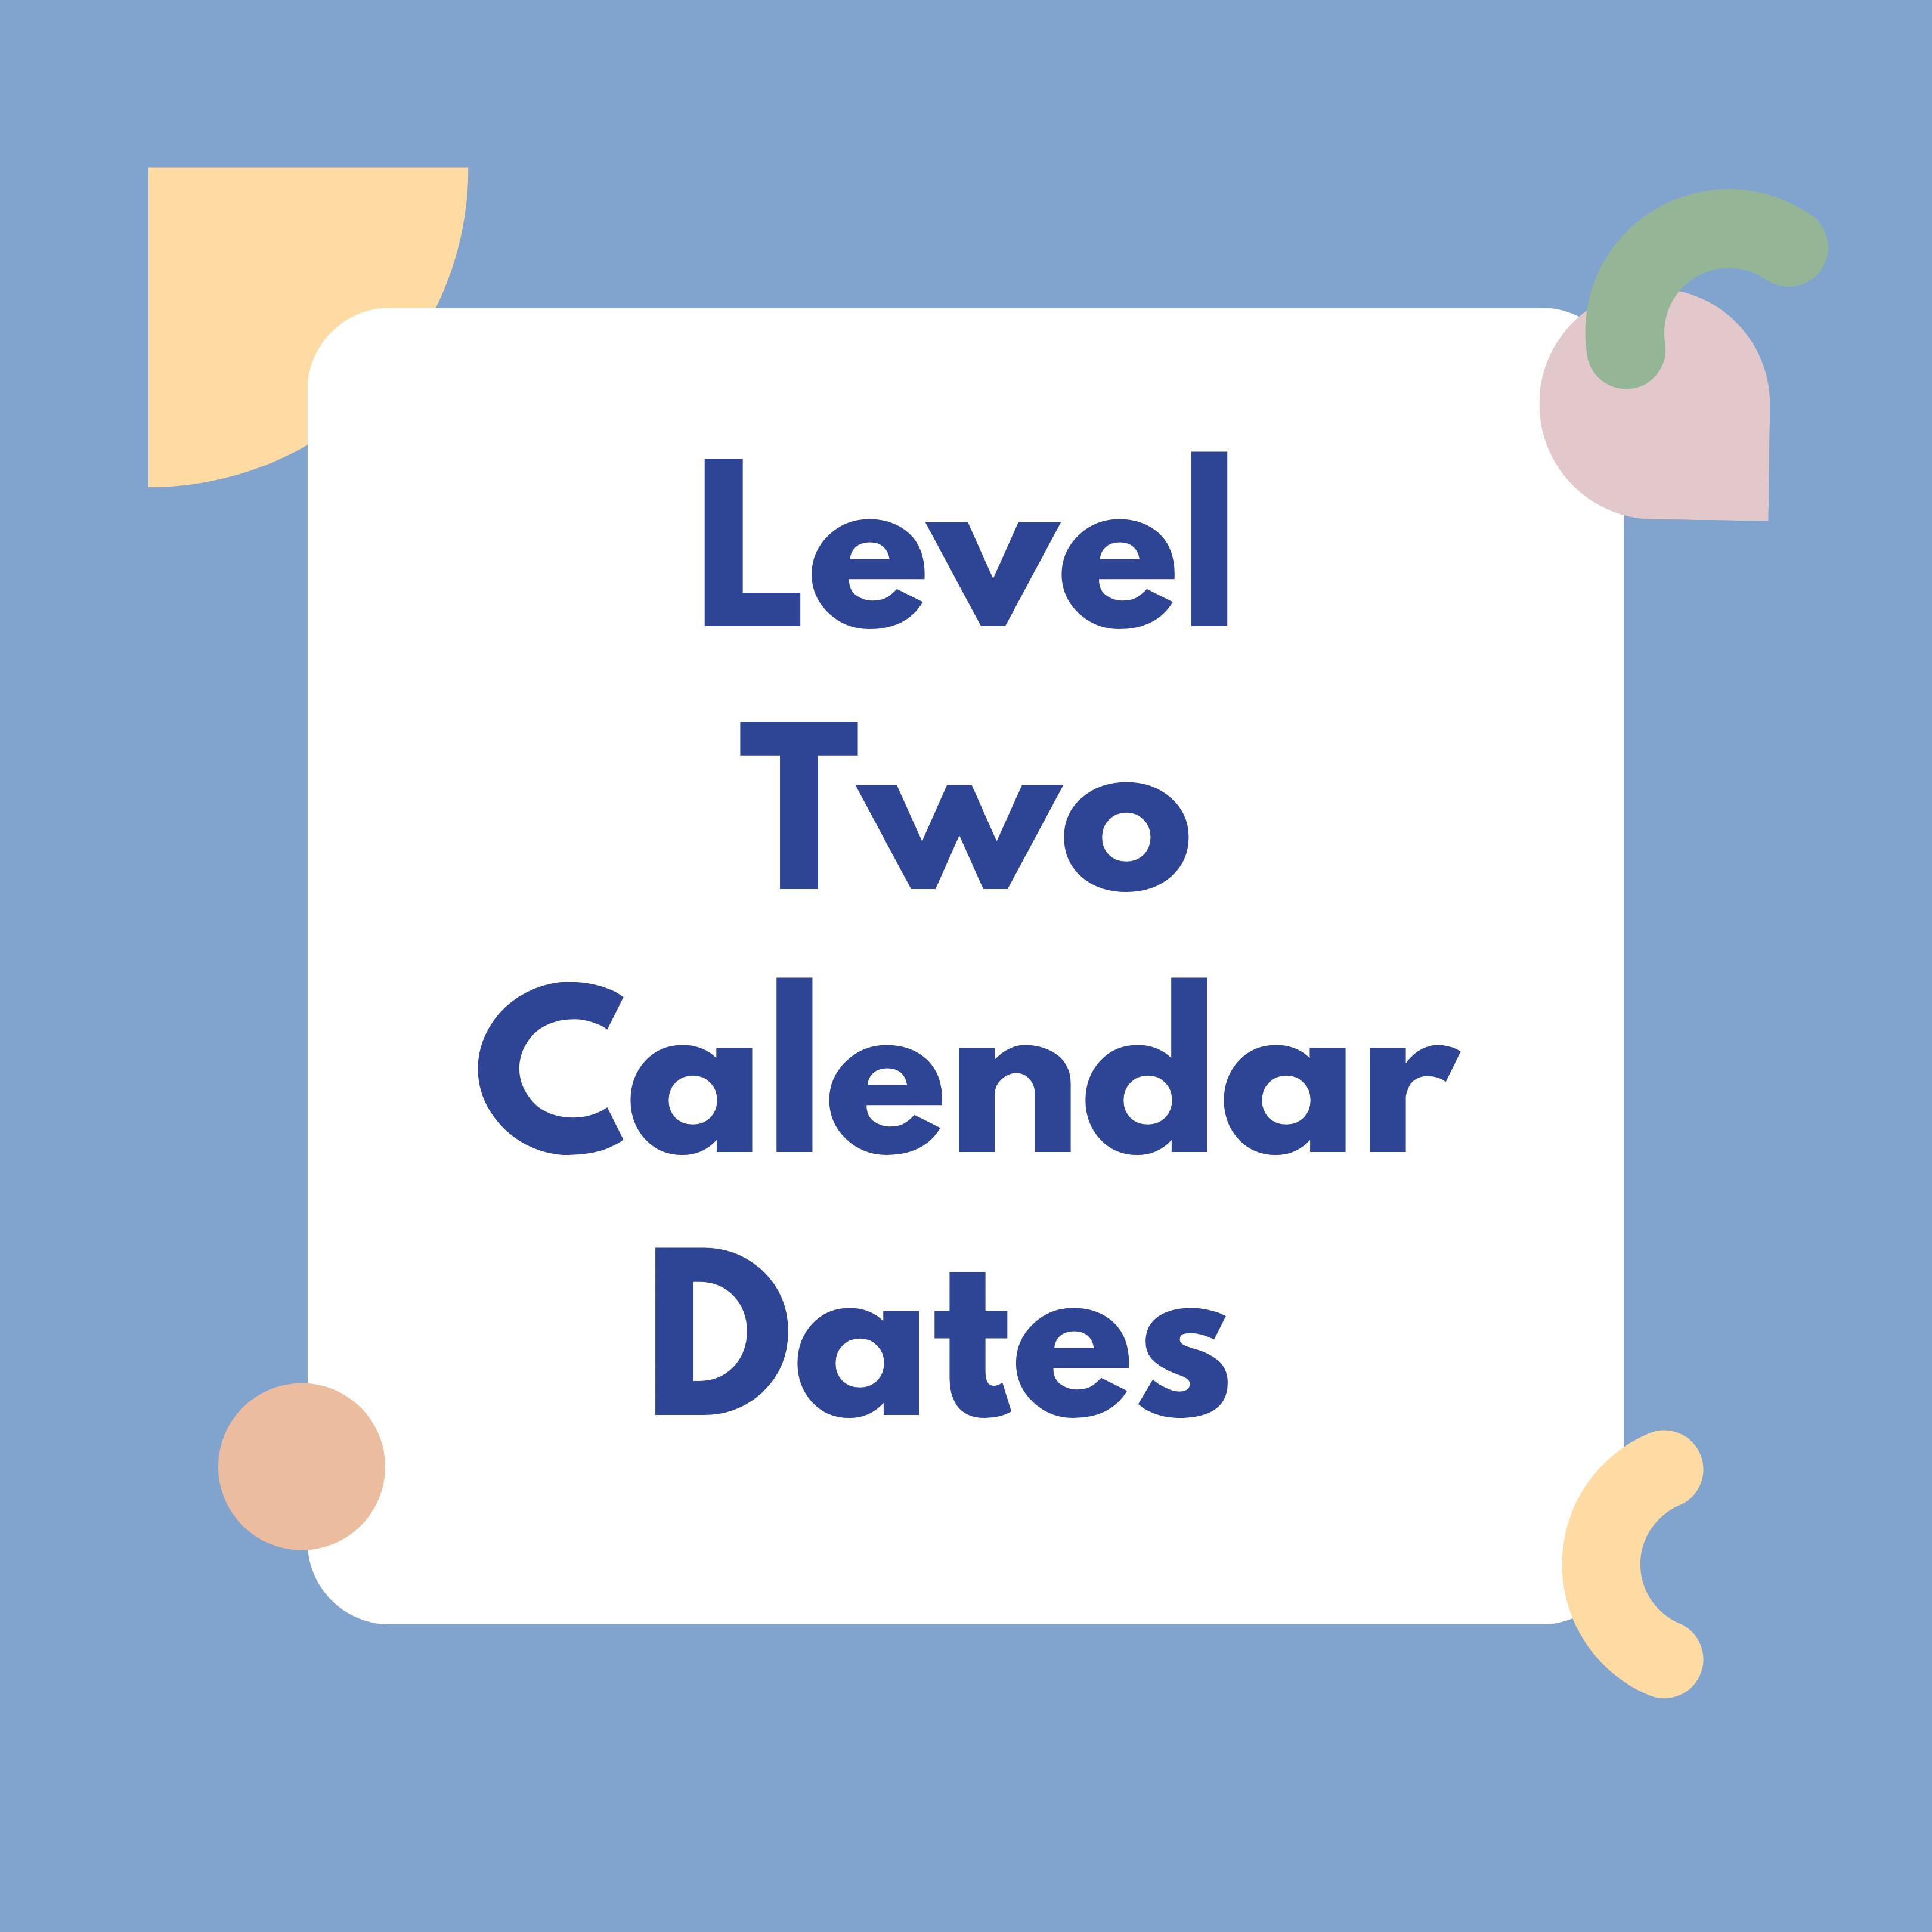 Level Two Calendar Dates 2021